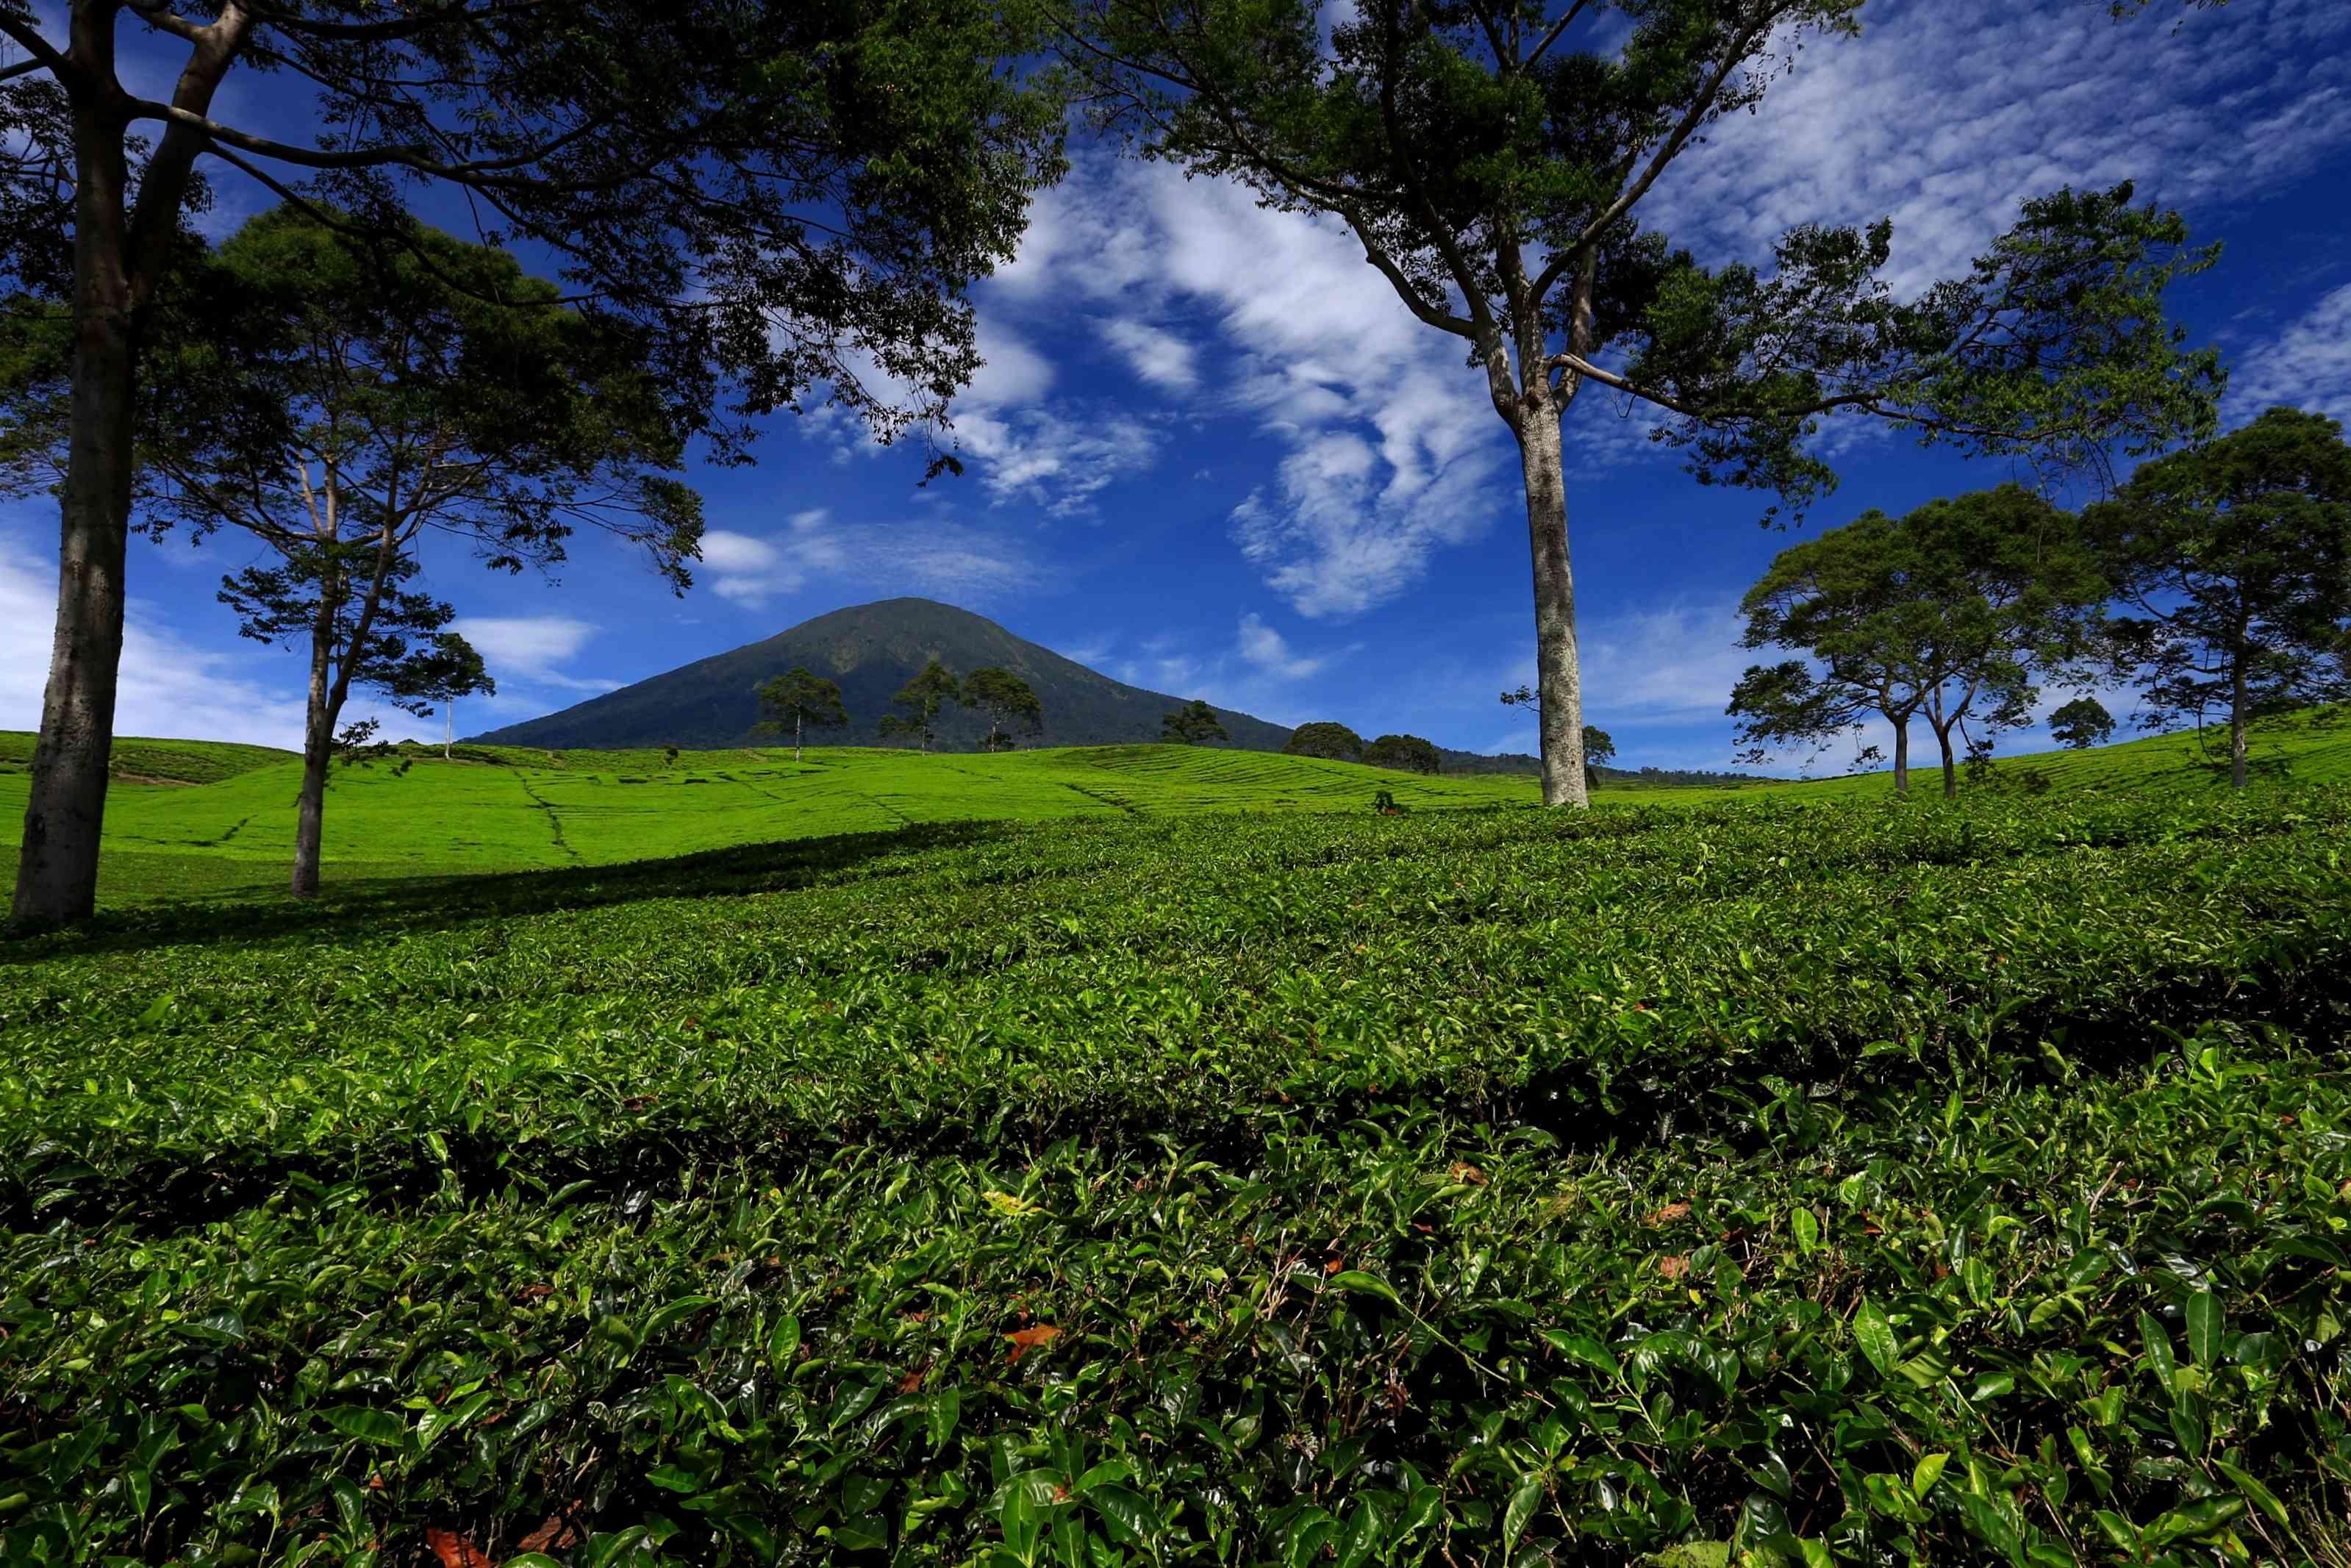 Gunung Dempo in the distance behind a tea plantation